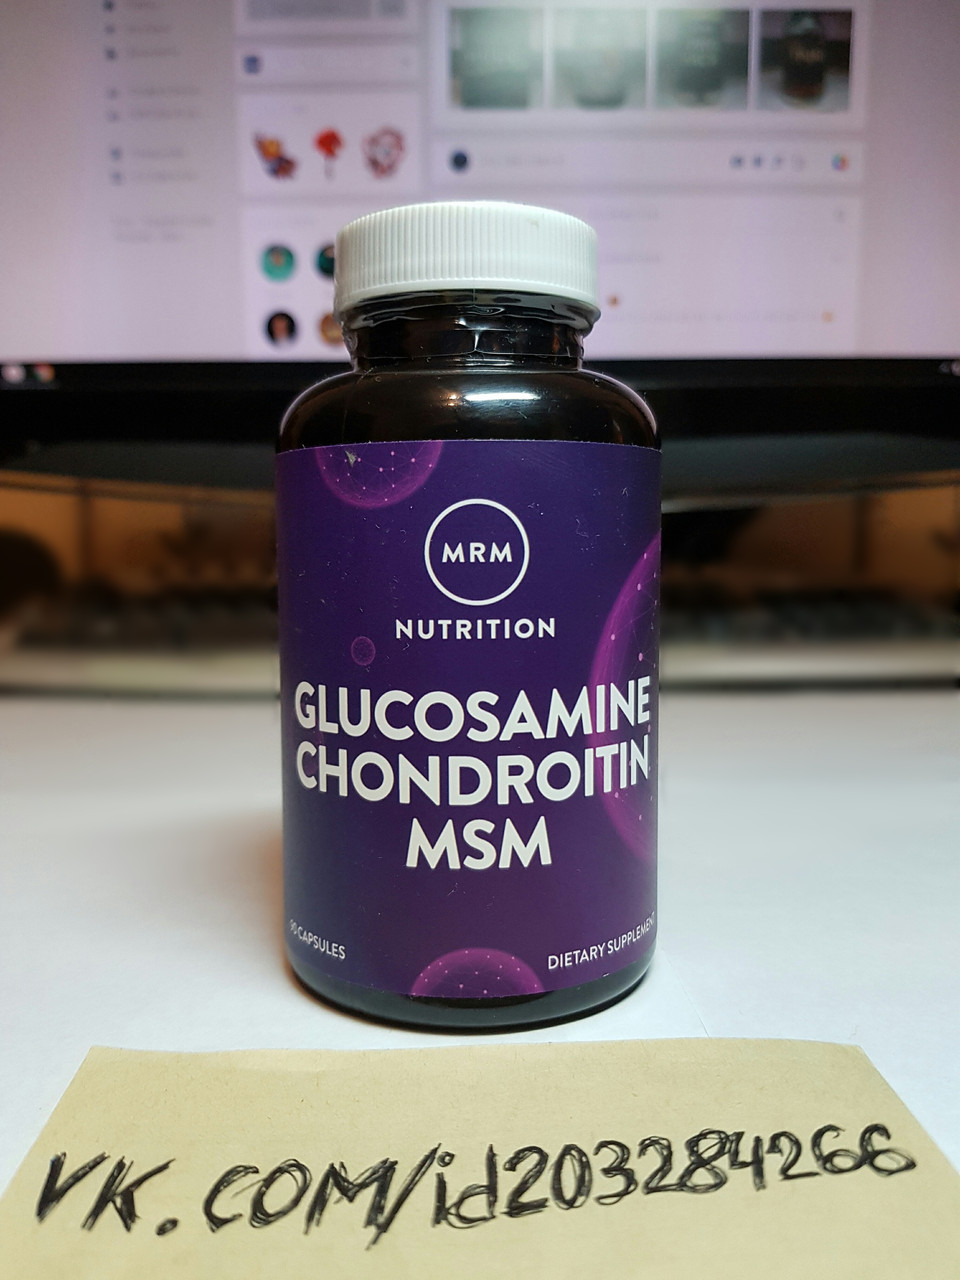 Витамины для суставов MRM Glucosamine & Chondroitin & MSM 90 капс мрм глюкозамин хондроитин мсм